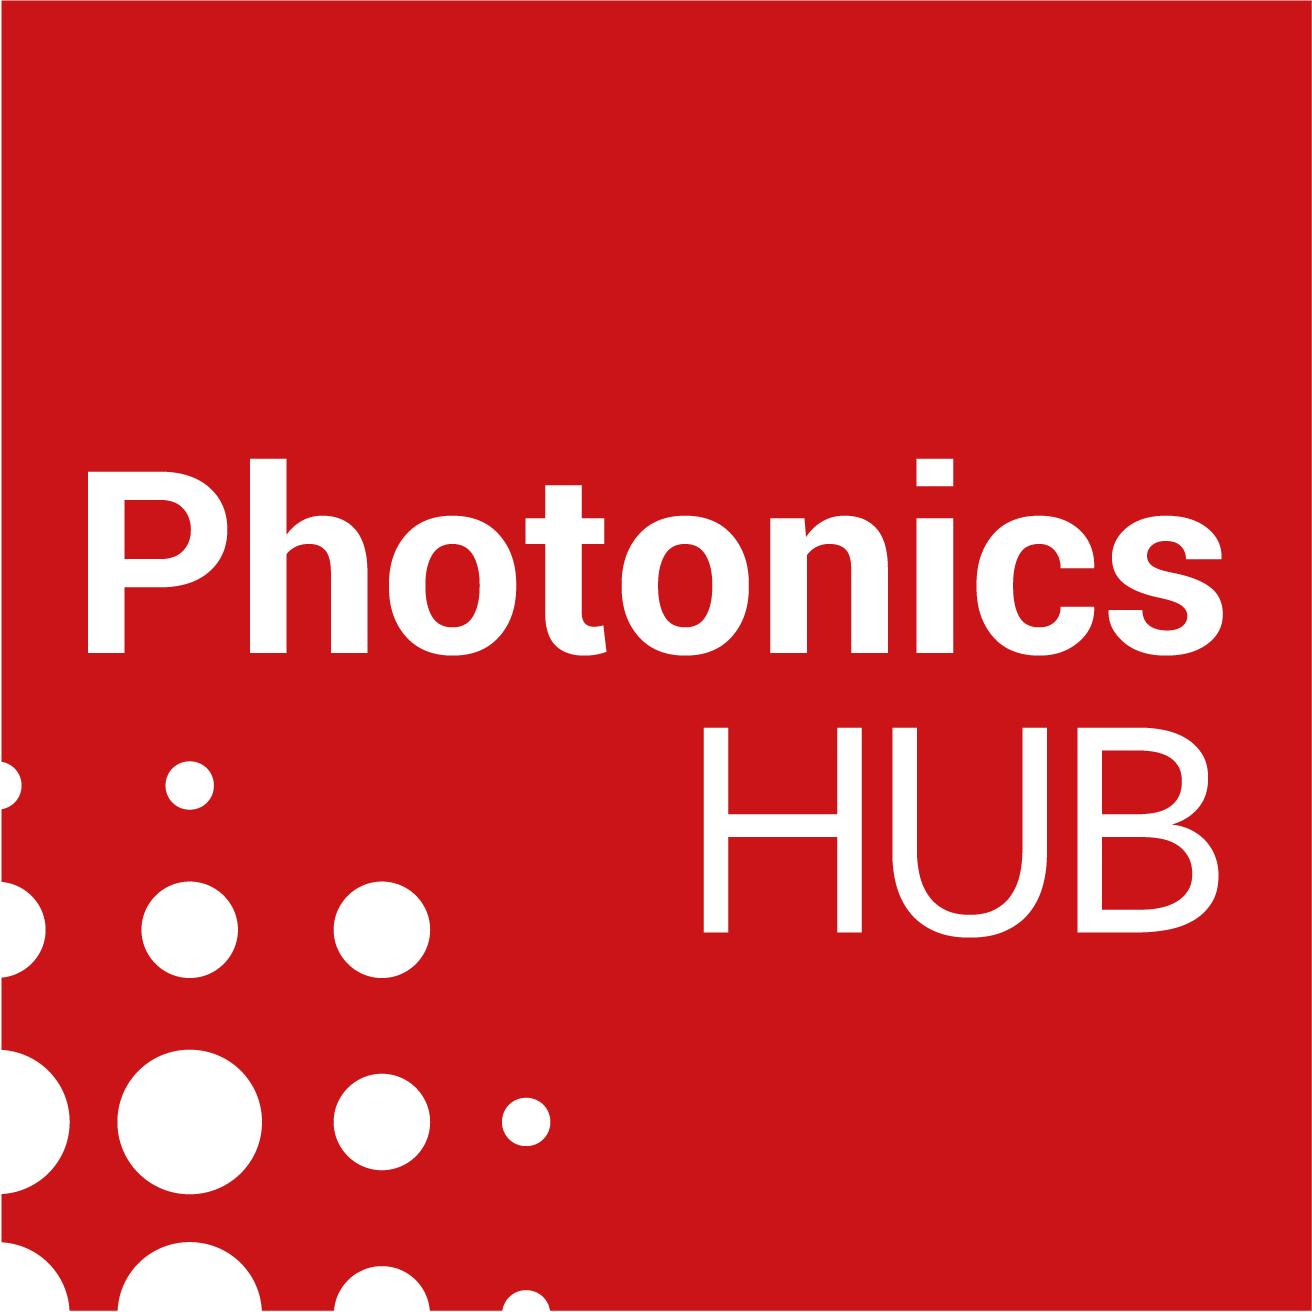 Image result for photonics hub logo